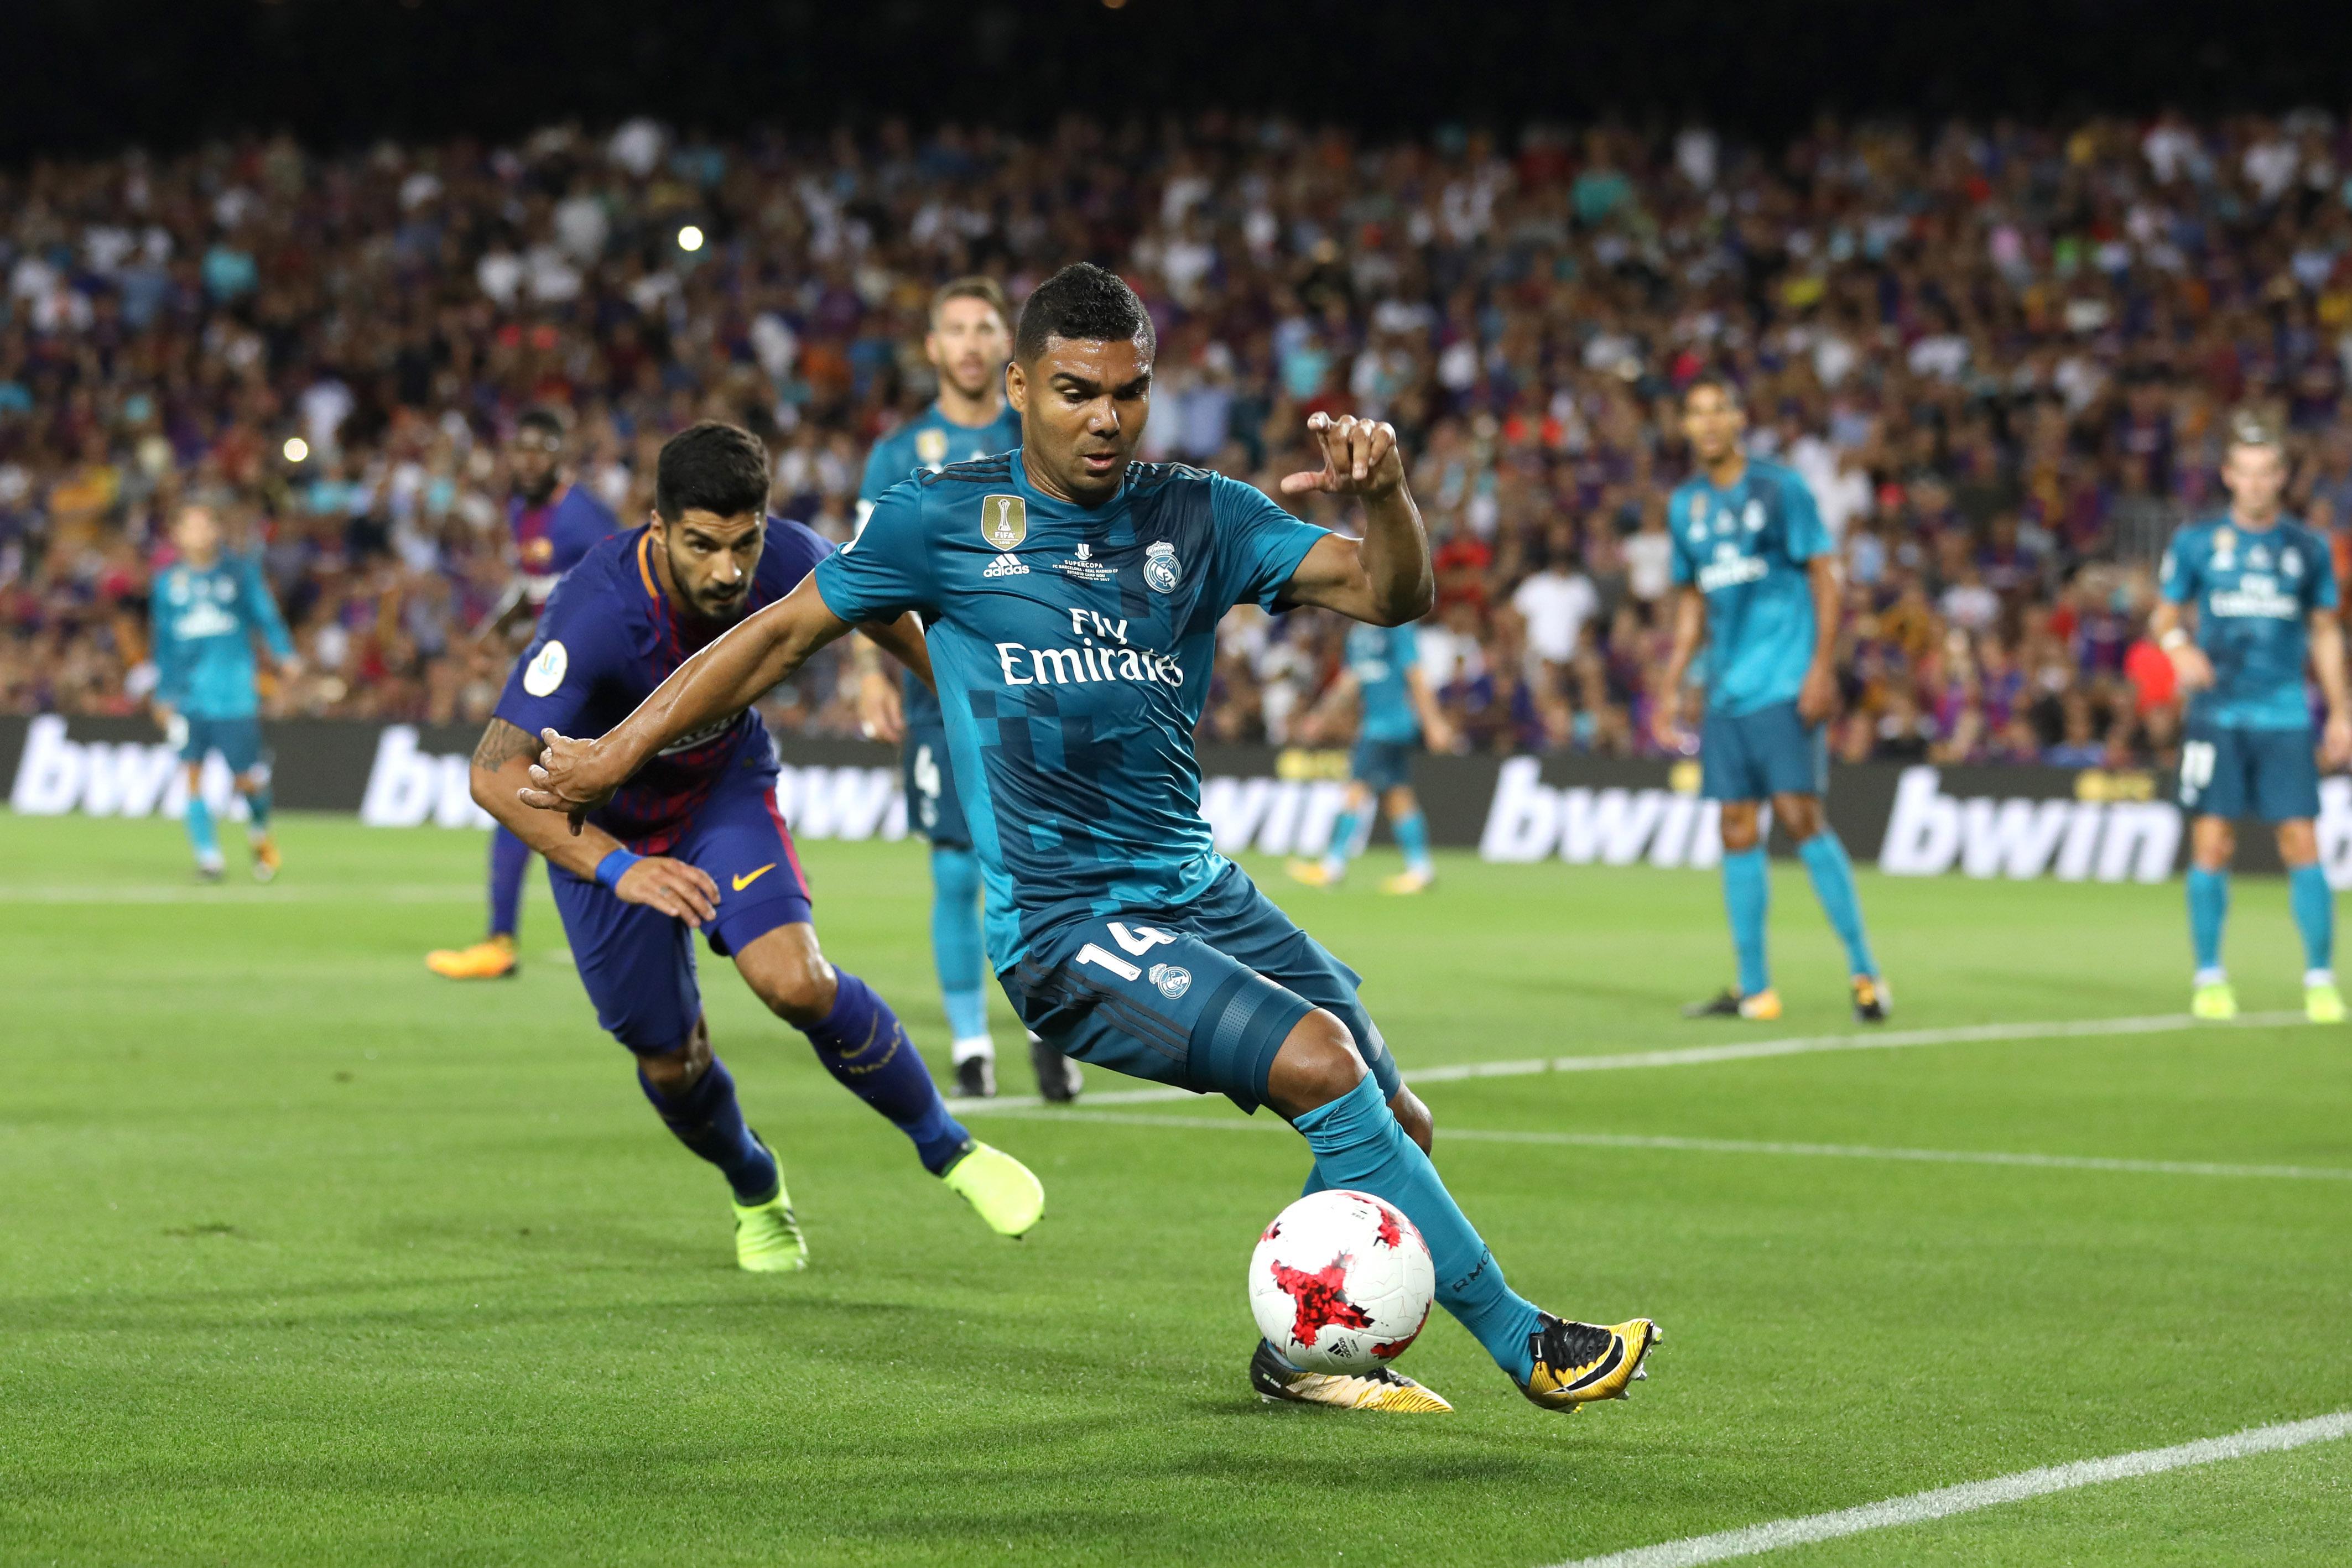 Manchester United show interest in Real Madrid midfielder Casemiro?